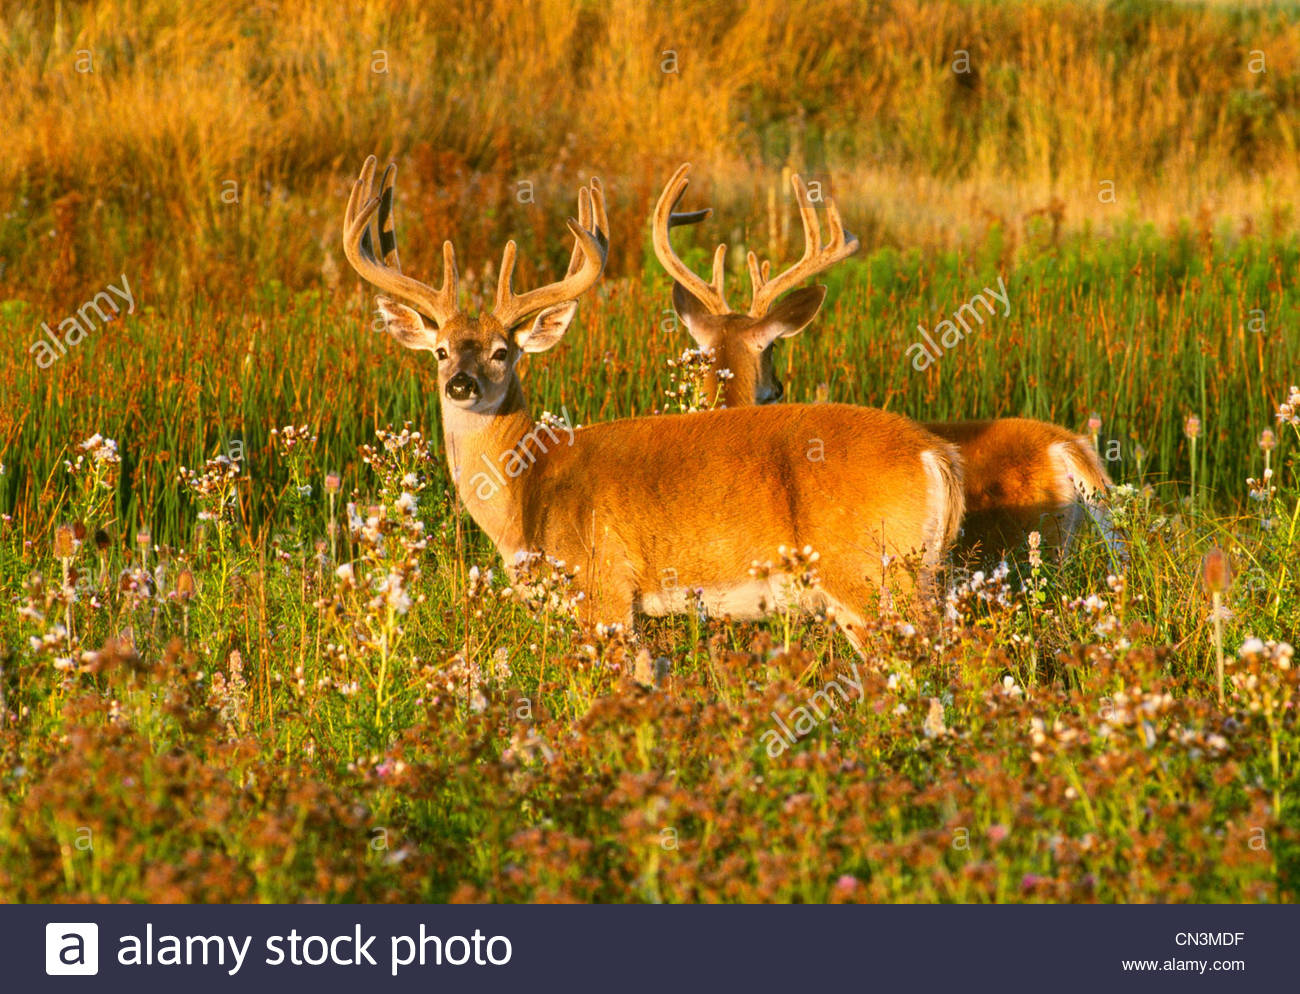 White-tailed deer, National Bison Range, Montana - Stock Image